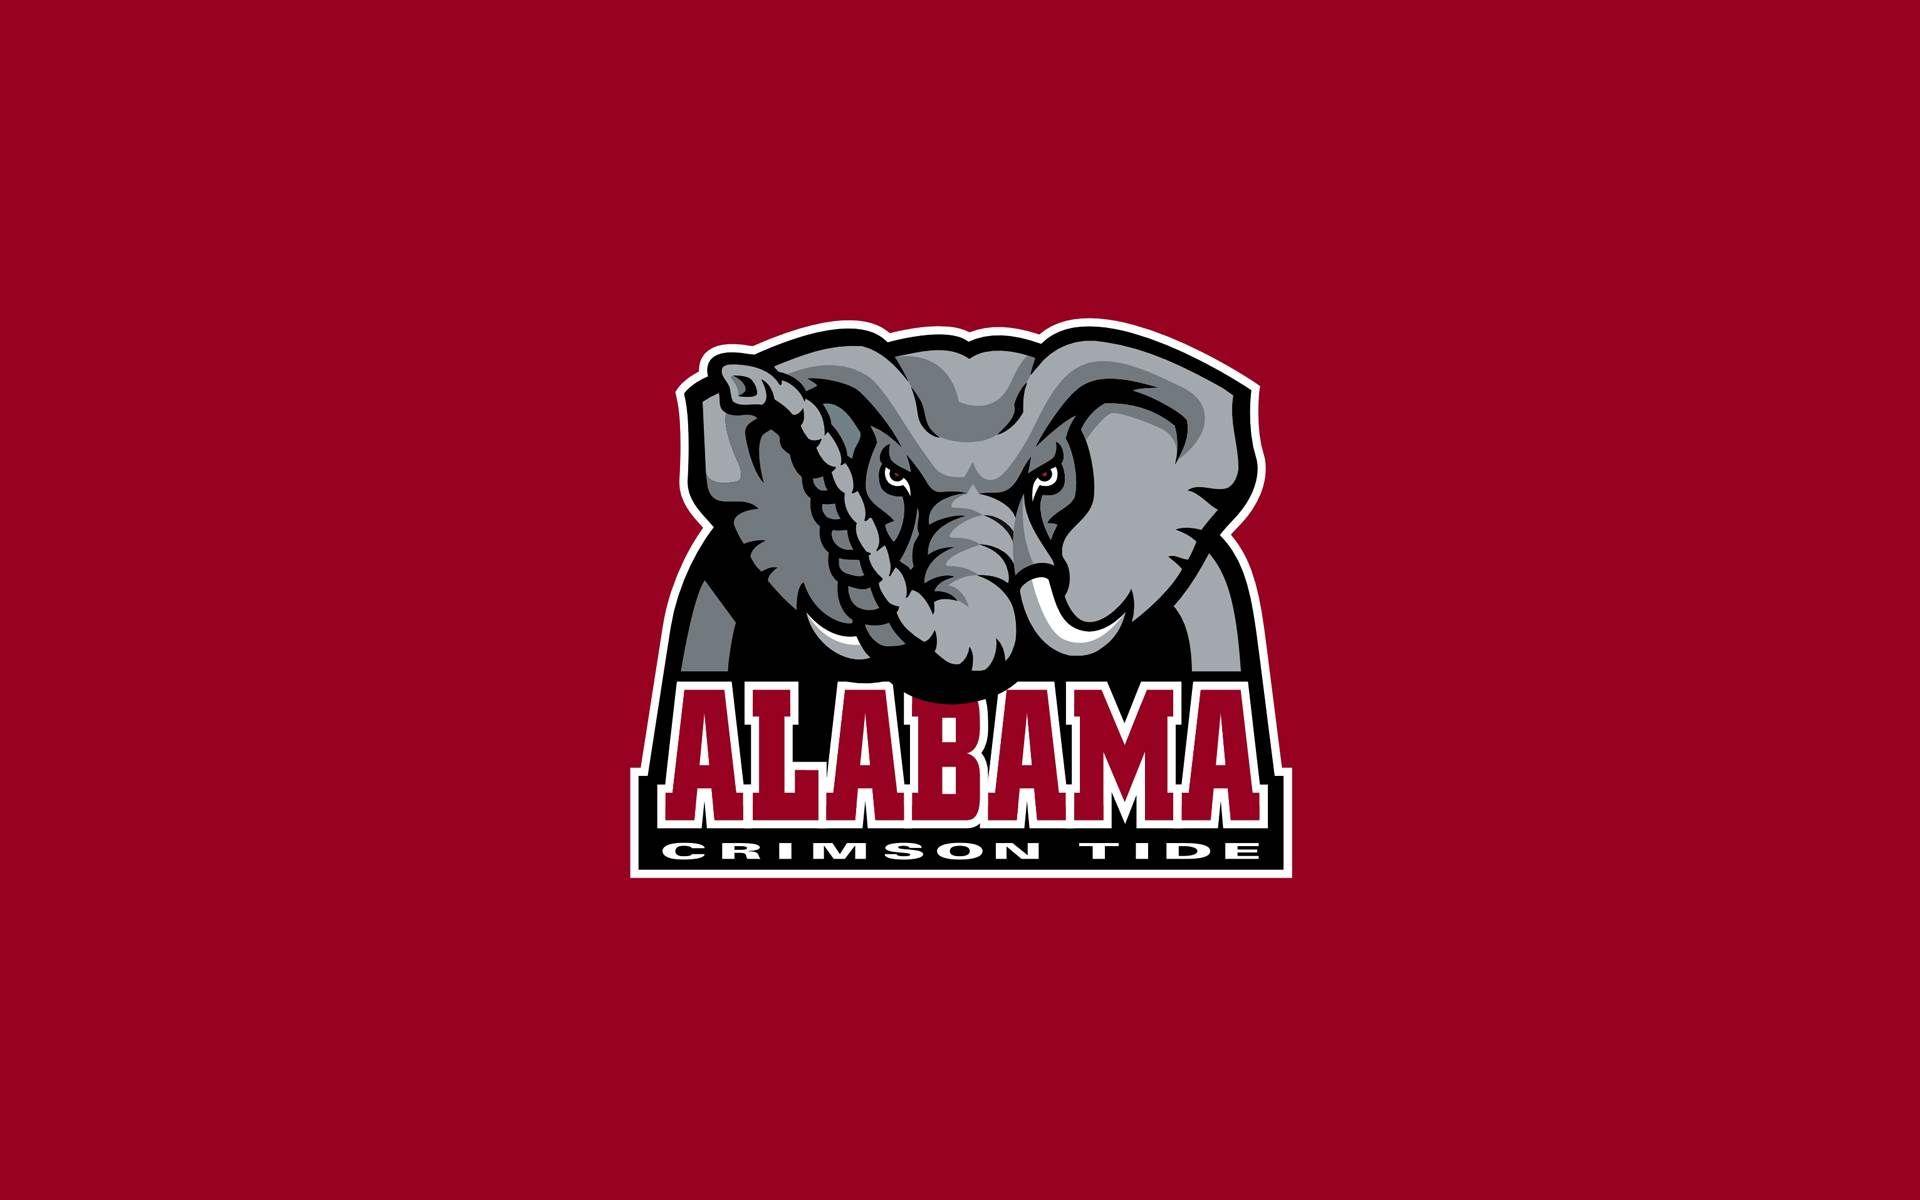 Alabama Wallpaper Hd Pixels Talk 1920 1200 Alabama Football Pictures Adorable Wallpapers Alabama Crimson Tide Logo Tide Logo Alabama Crimson Tide